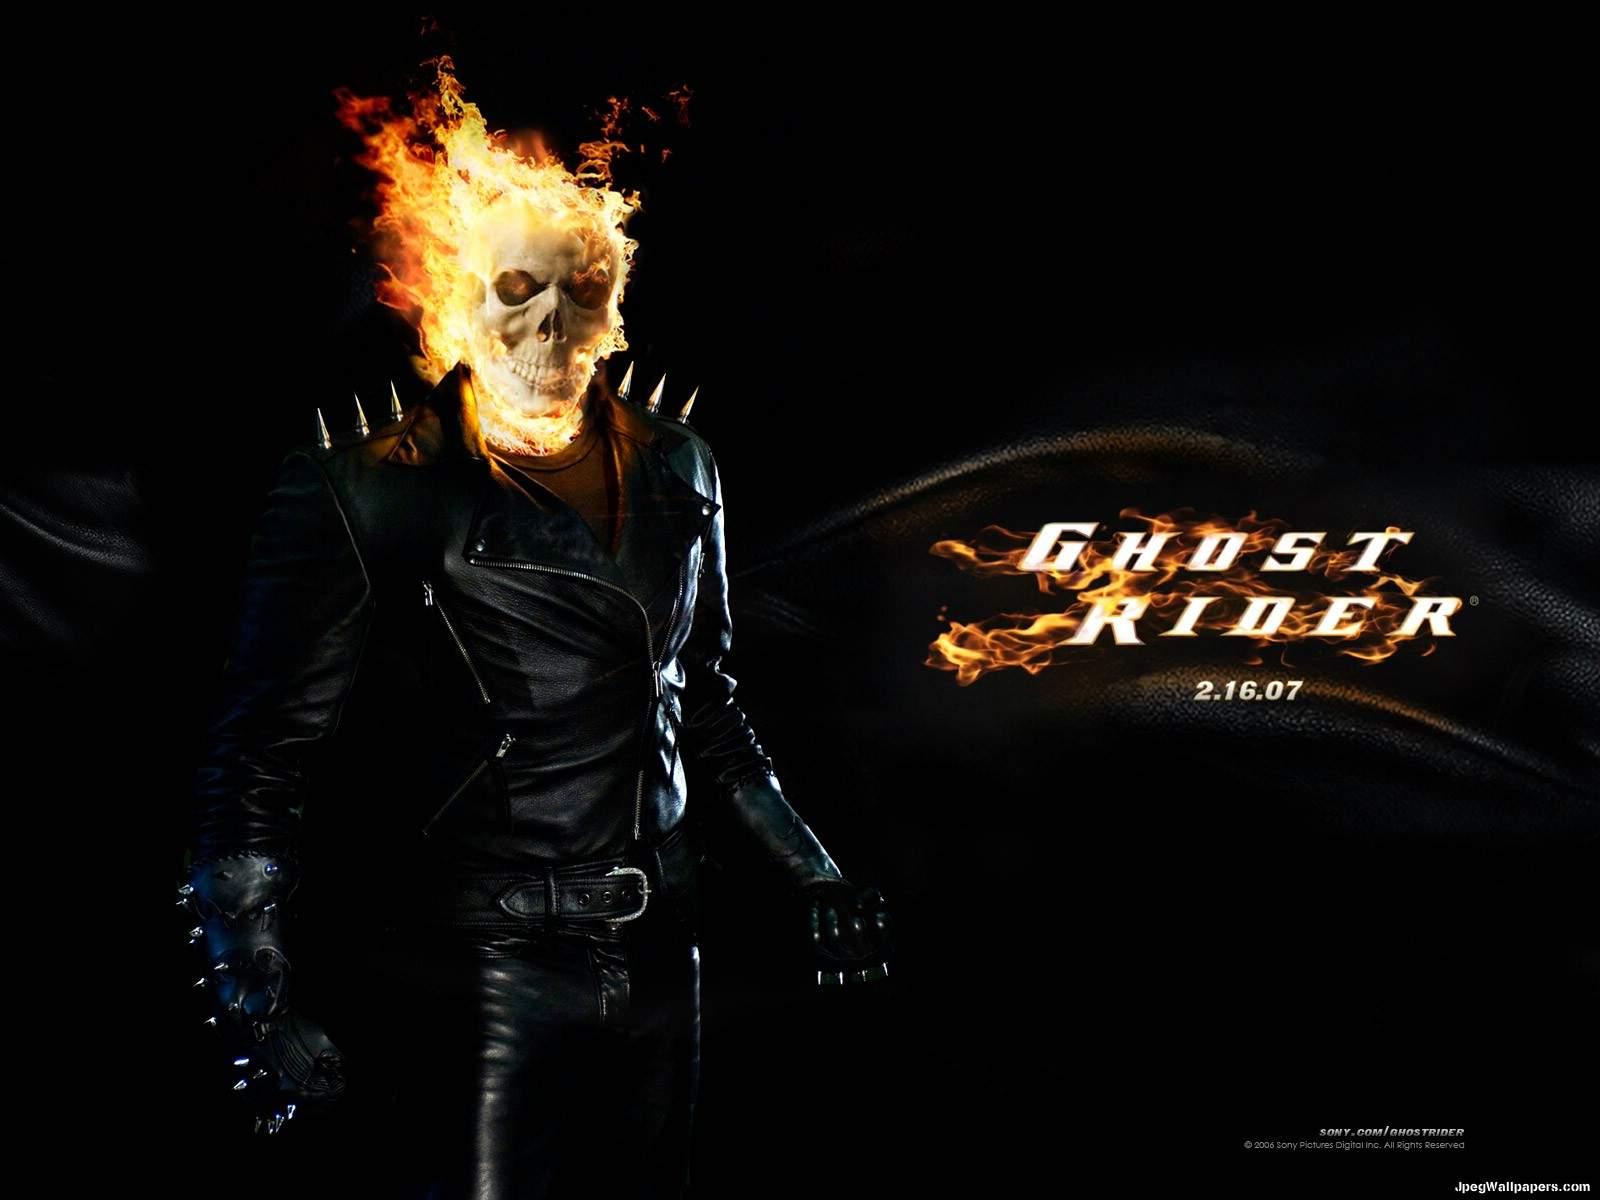 Ghost Rider wallpaper 1600x1200